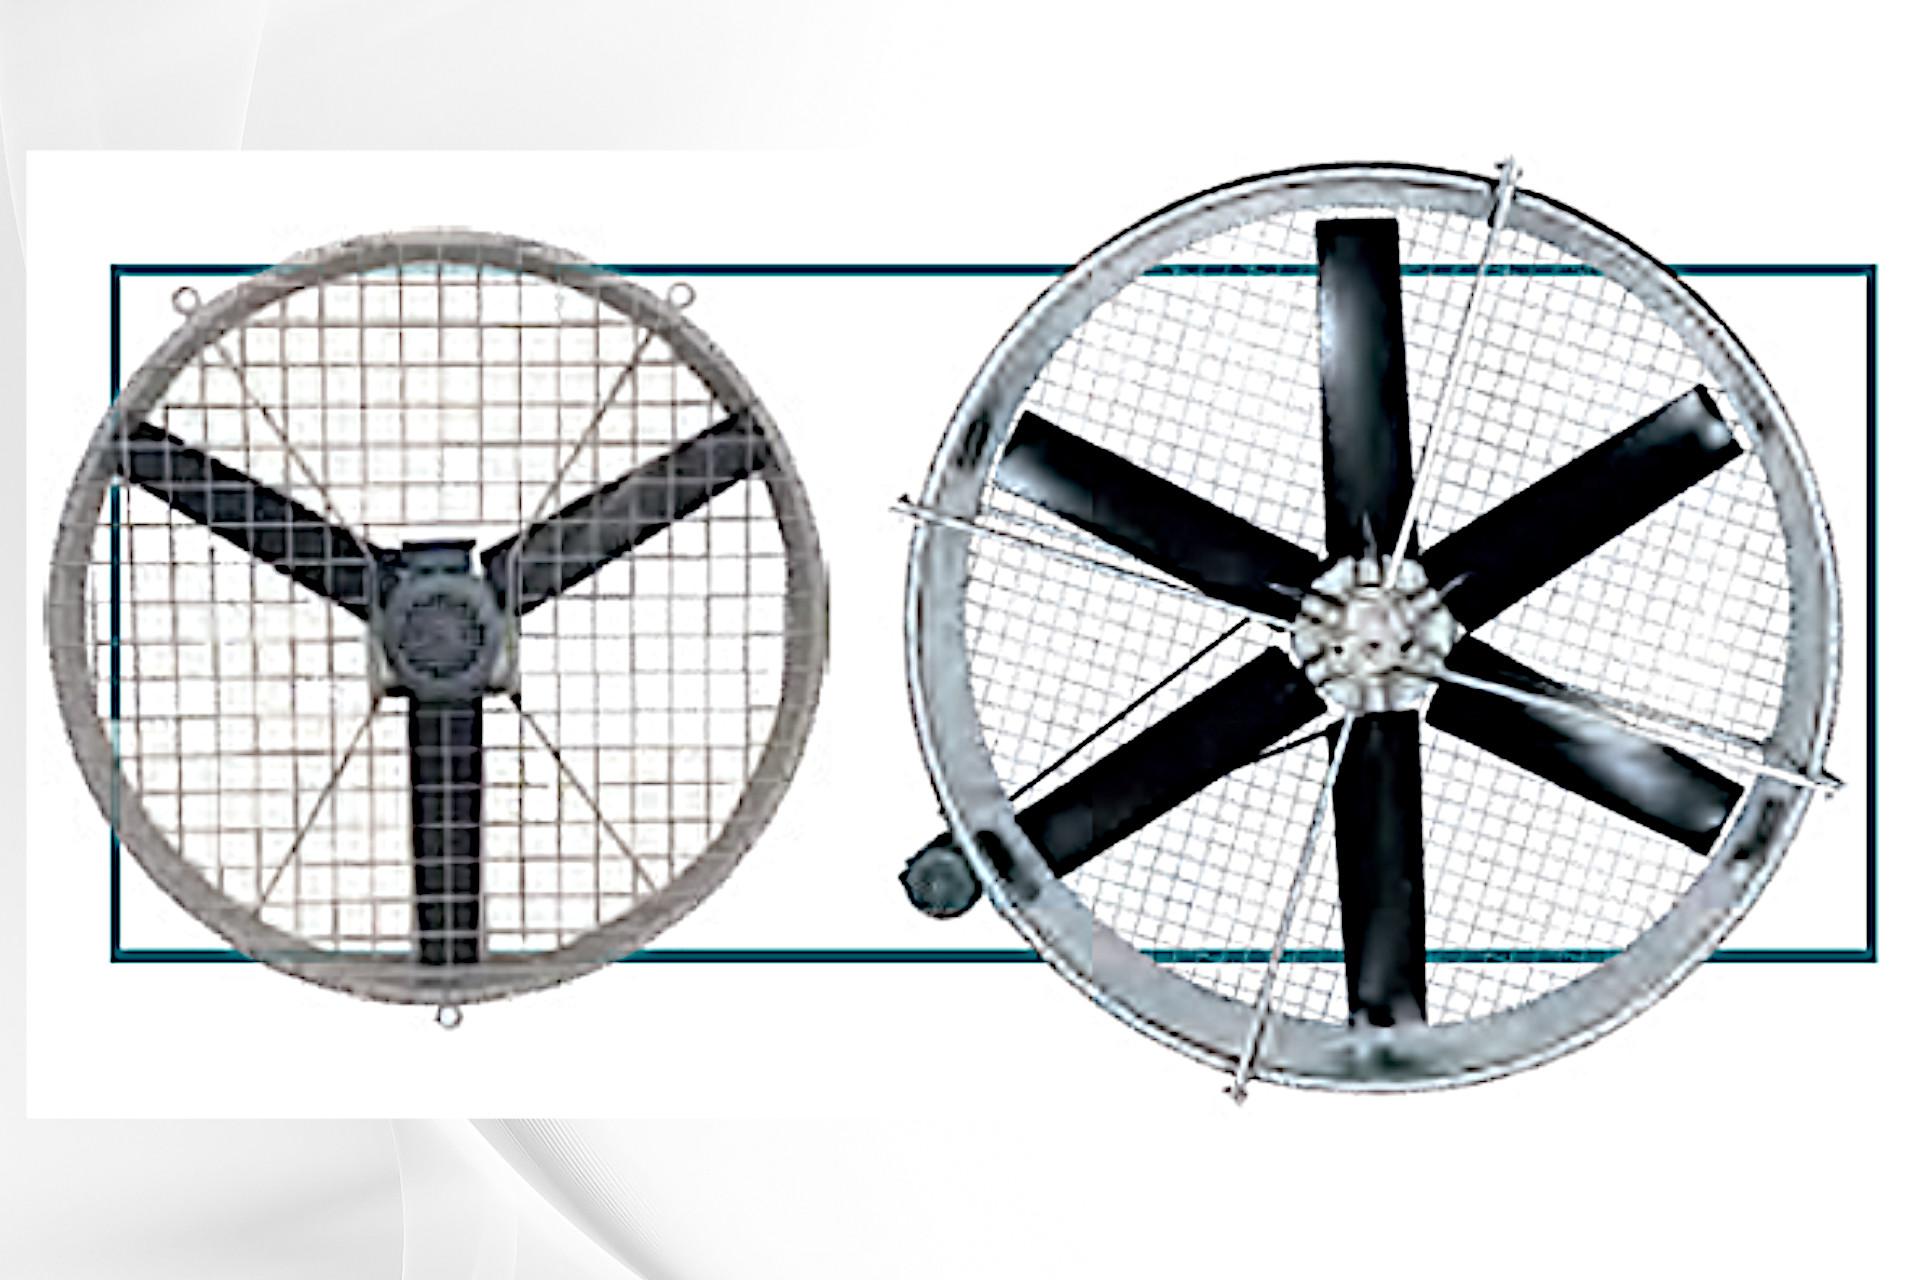 Rigel Ventilating And Cooling Fan - Tosun Farm Machines Izmir